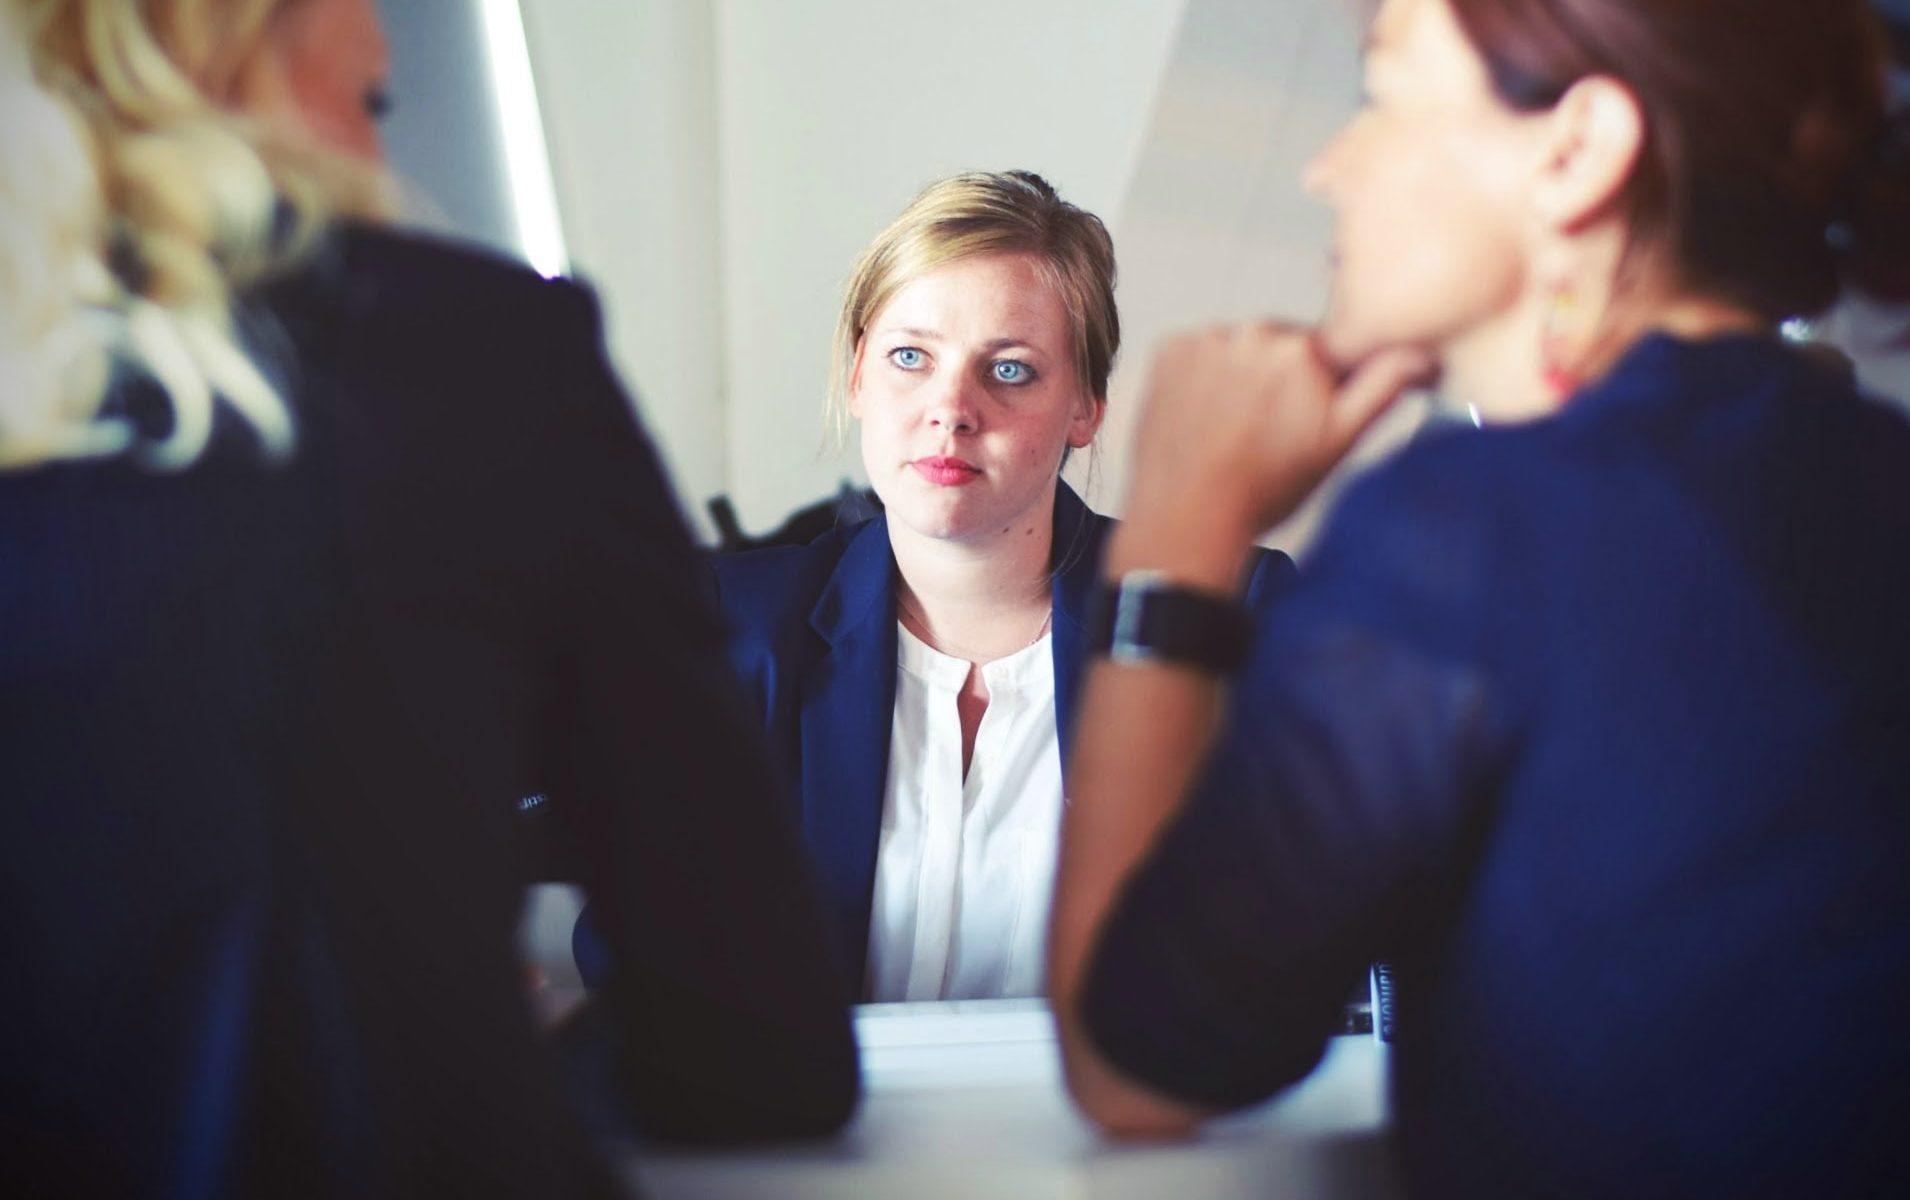 workplace complaint investigation